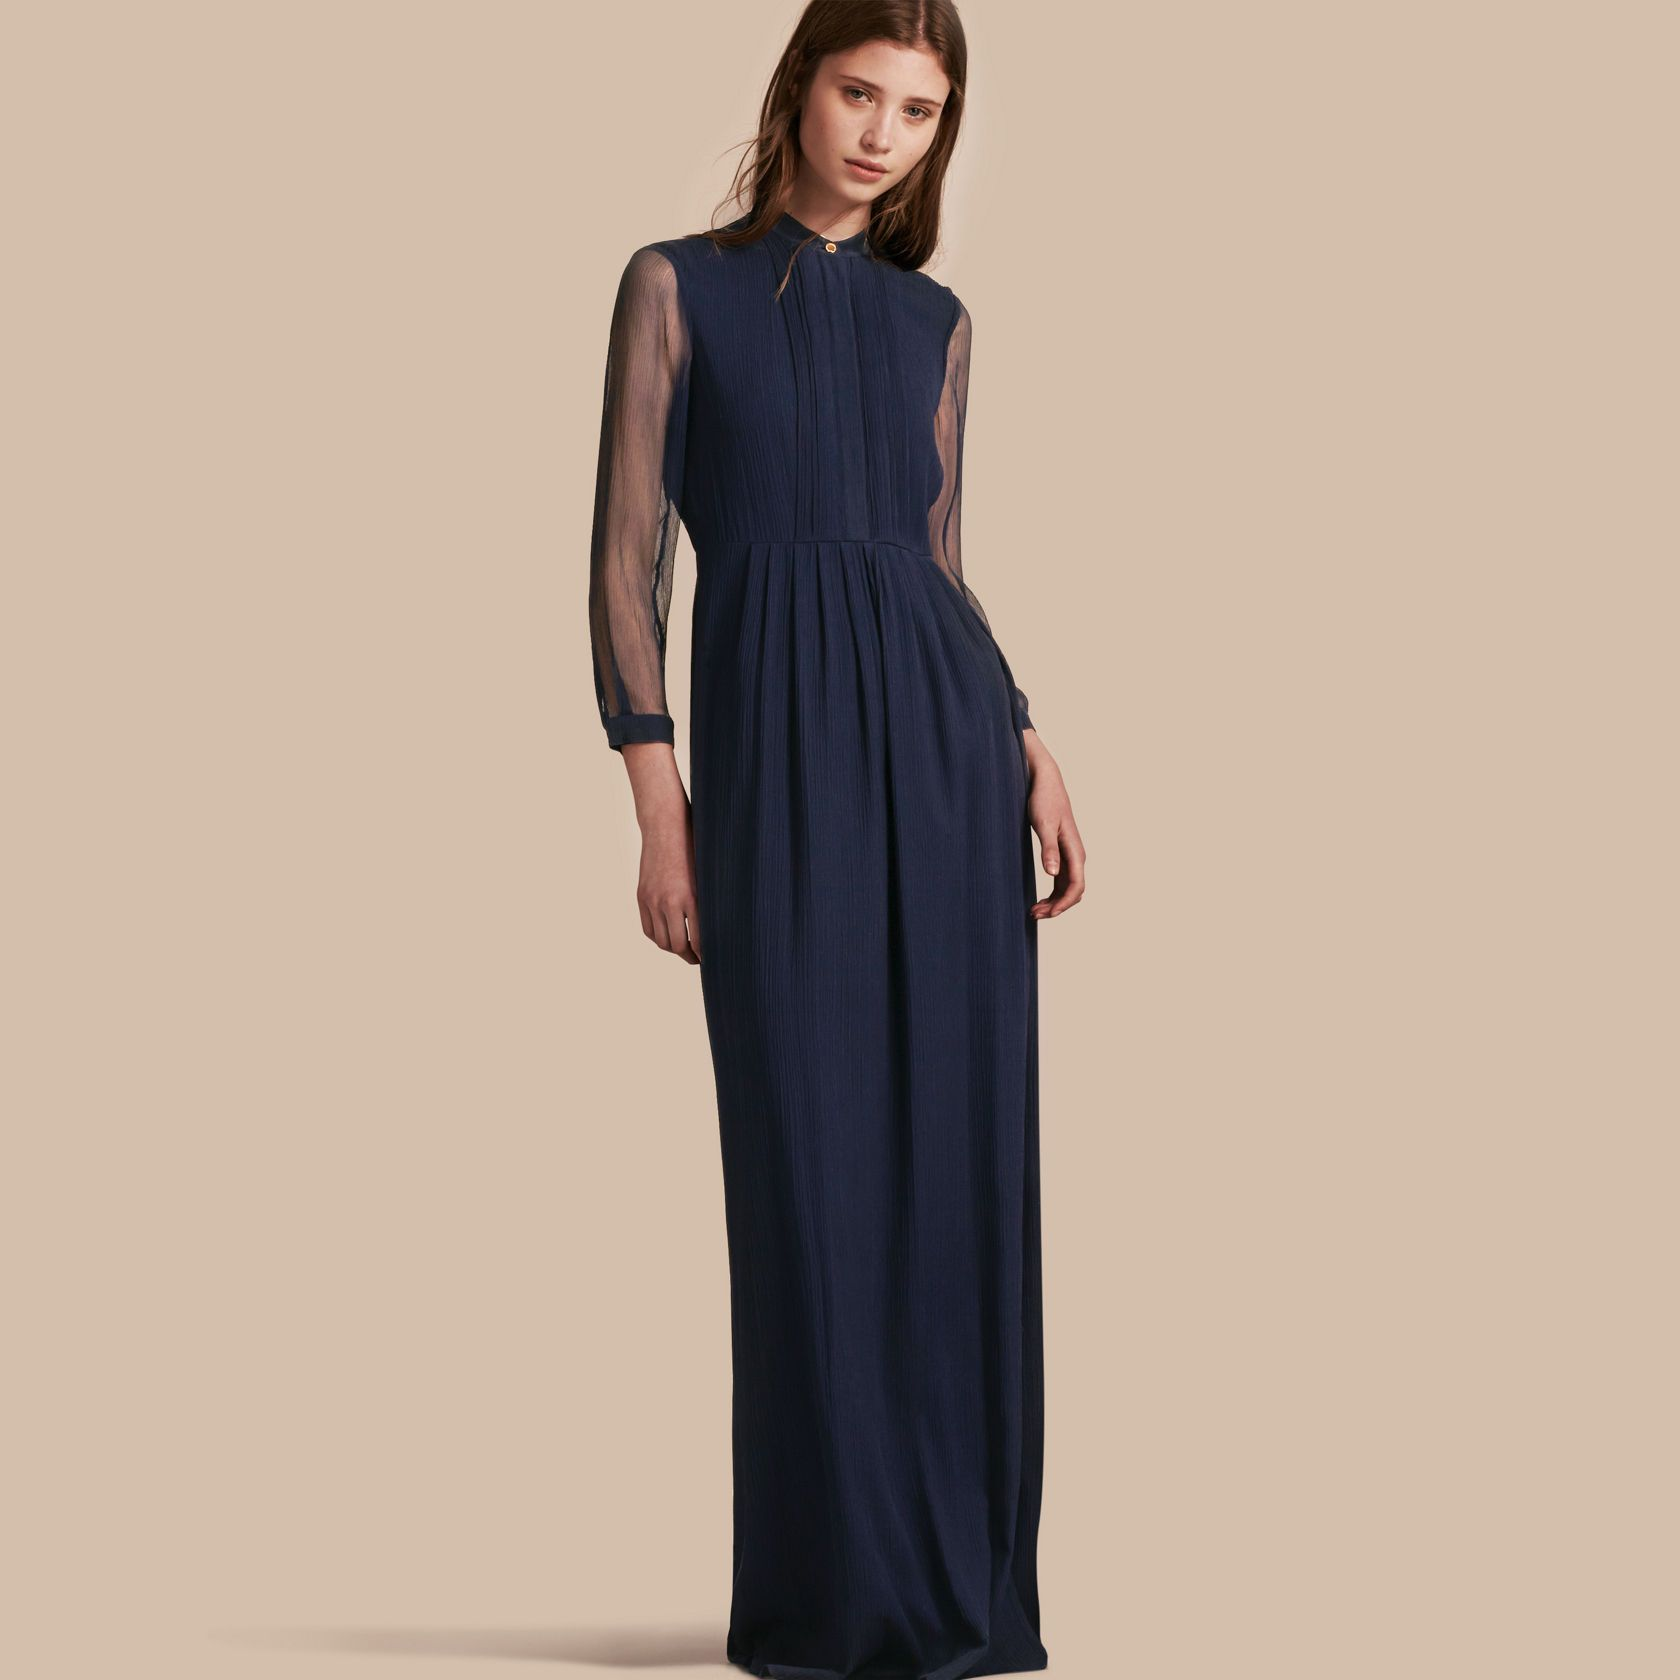 Pleat detail floorlength silk dress burberry fashion woman